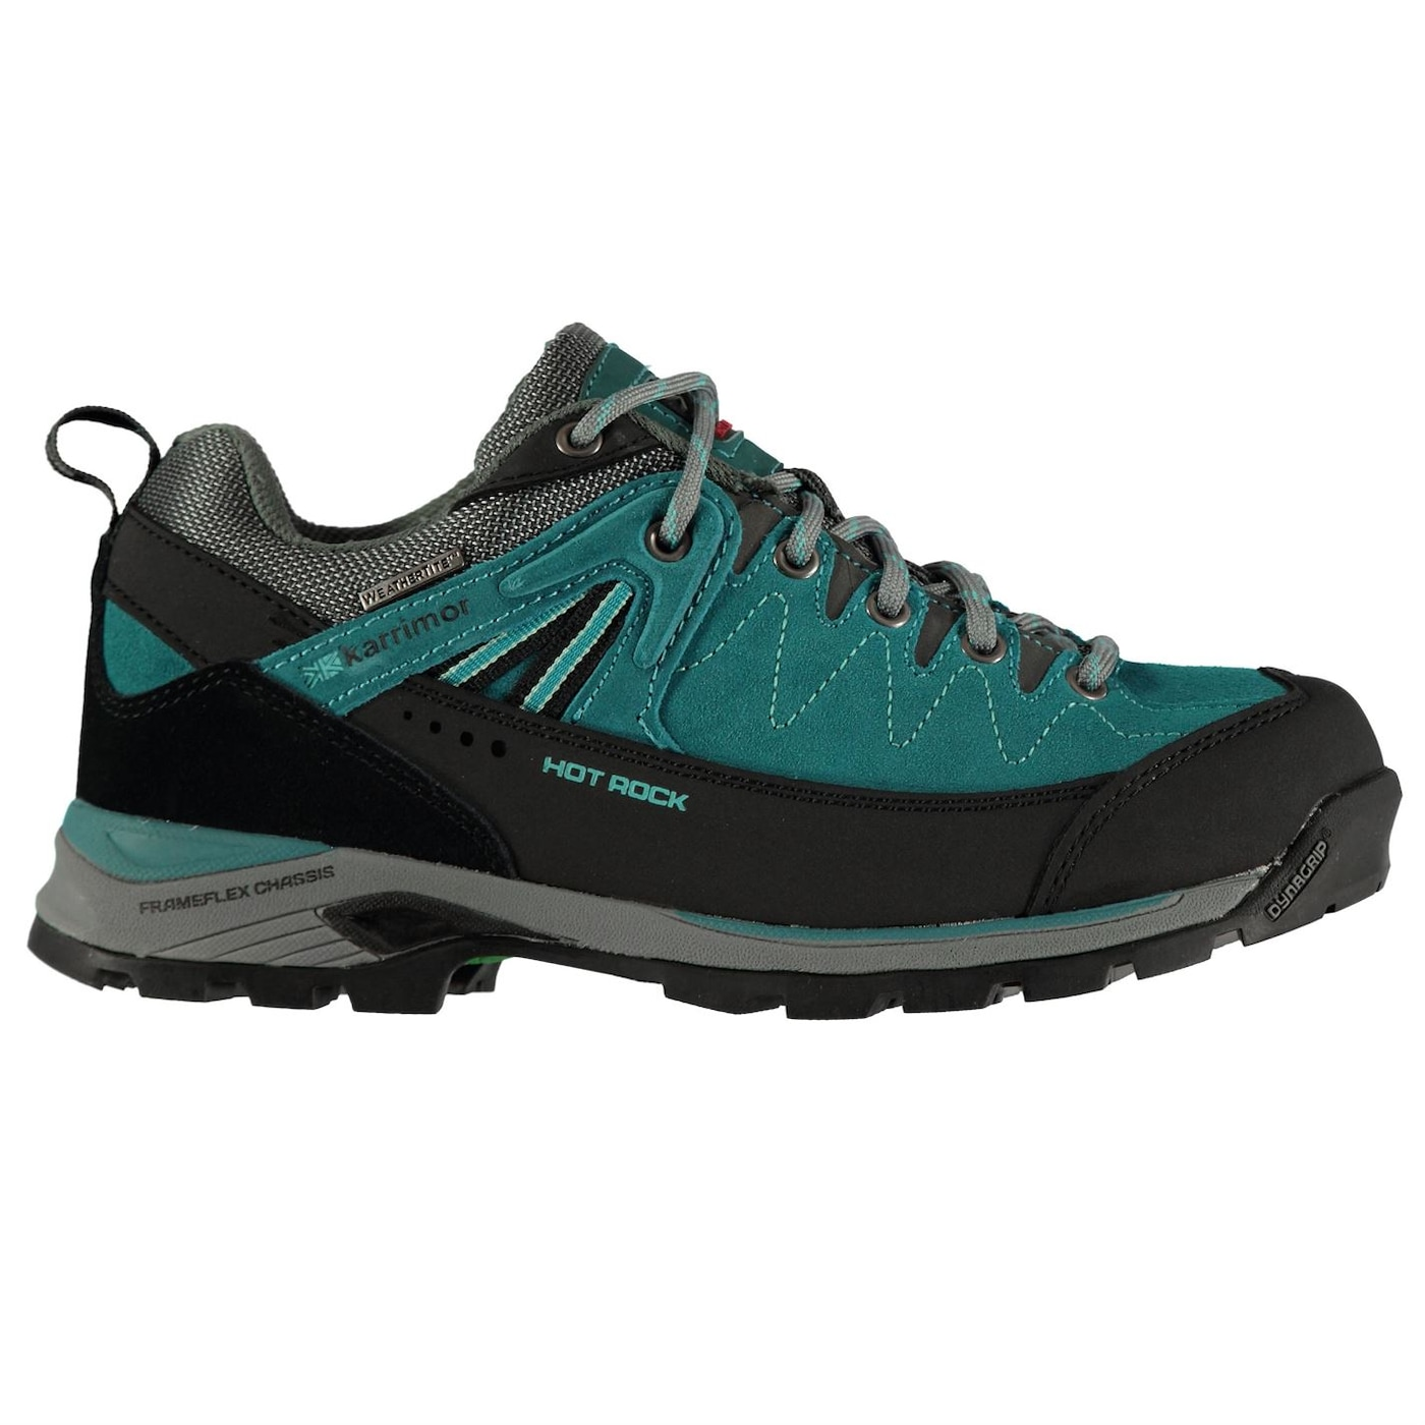 boty Karrimor Hot Rock Low dámské Walking Shoes